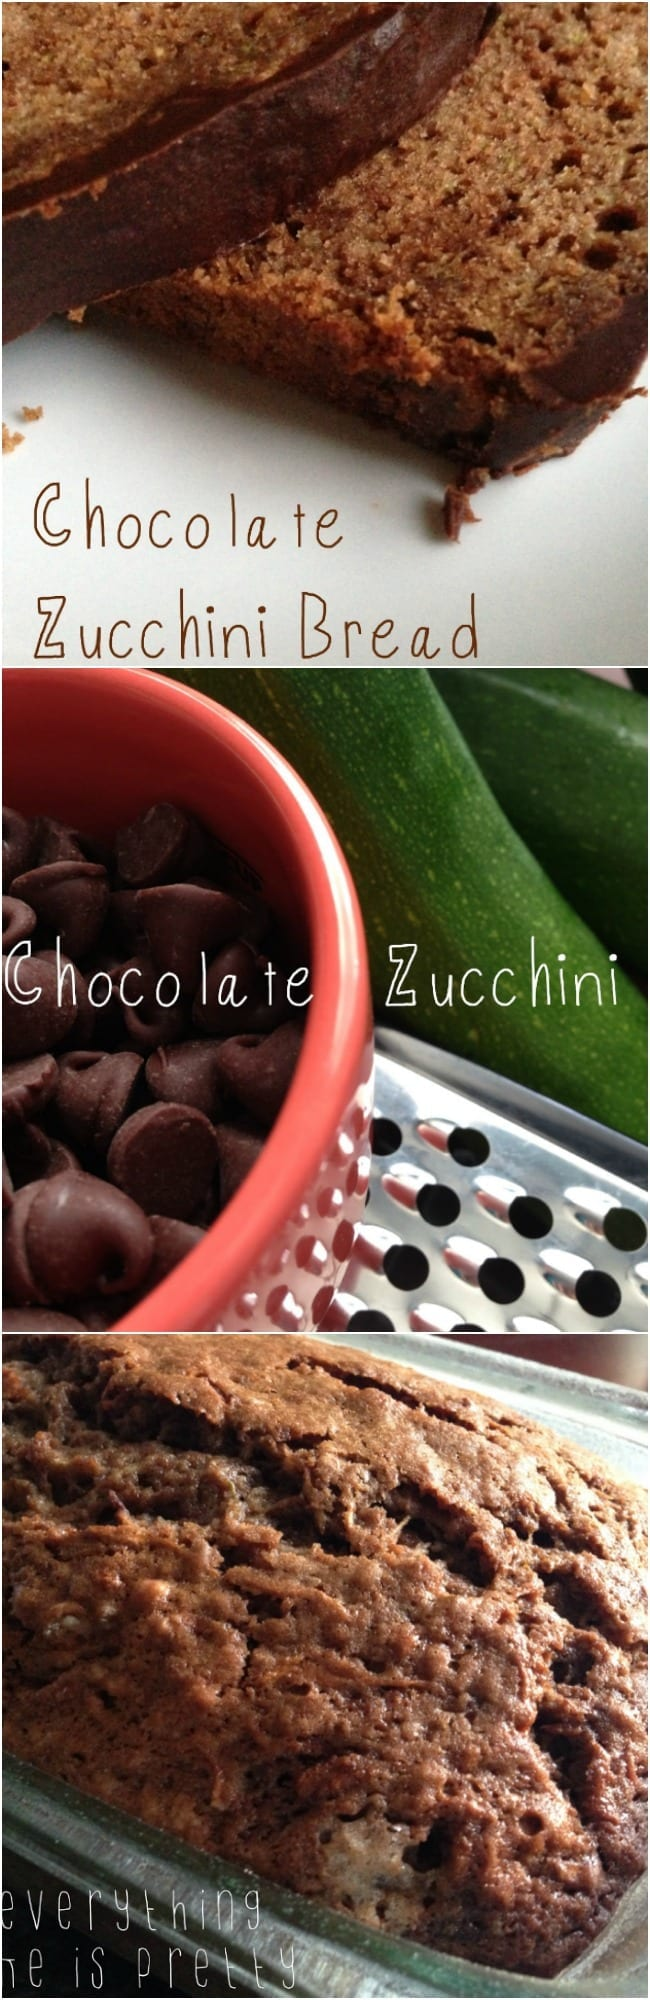 Homemade chocolate zucchini bread covered in chocolate ganache!